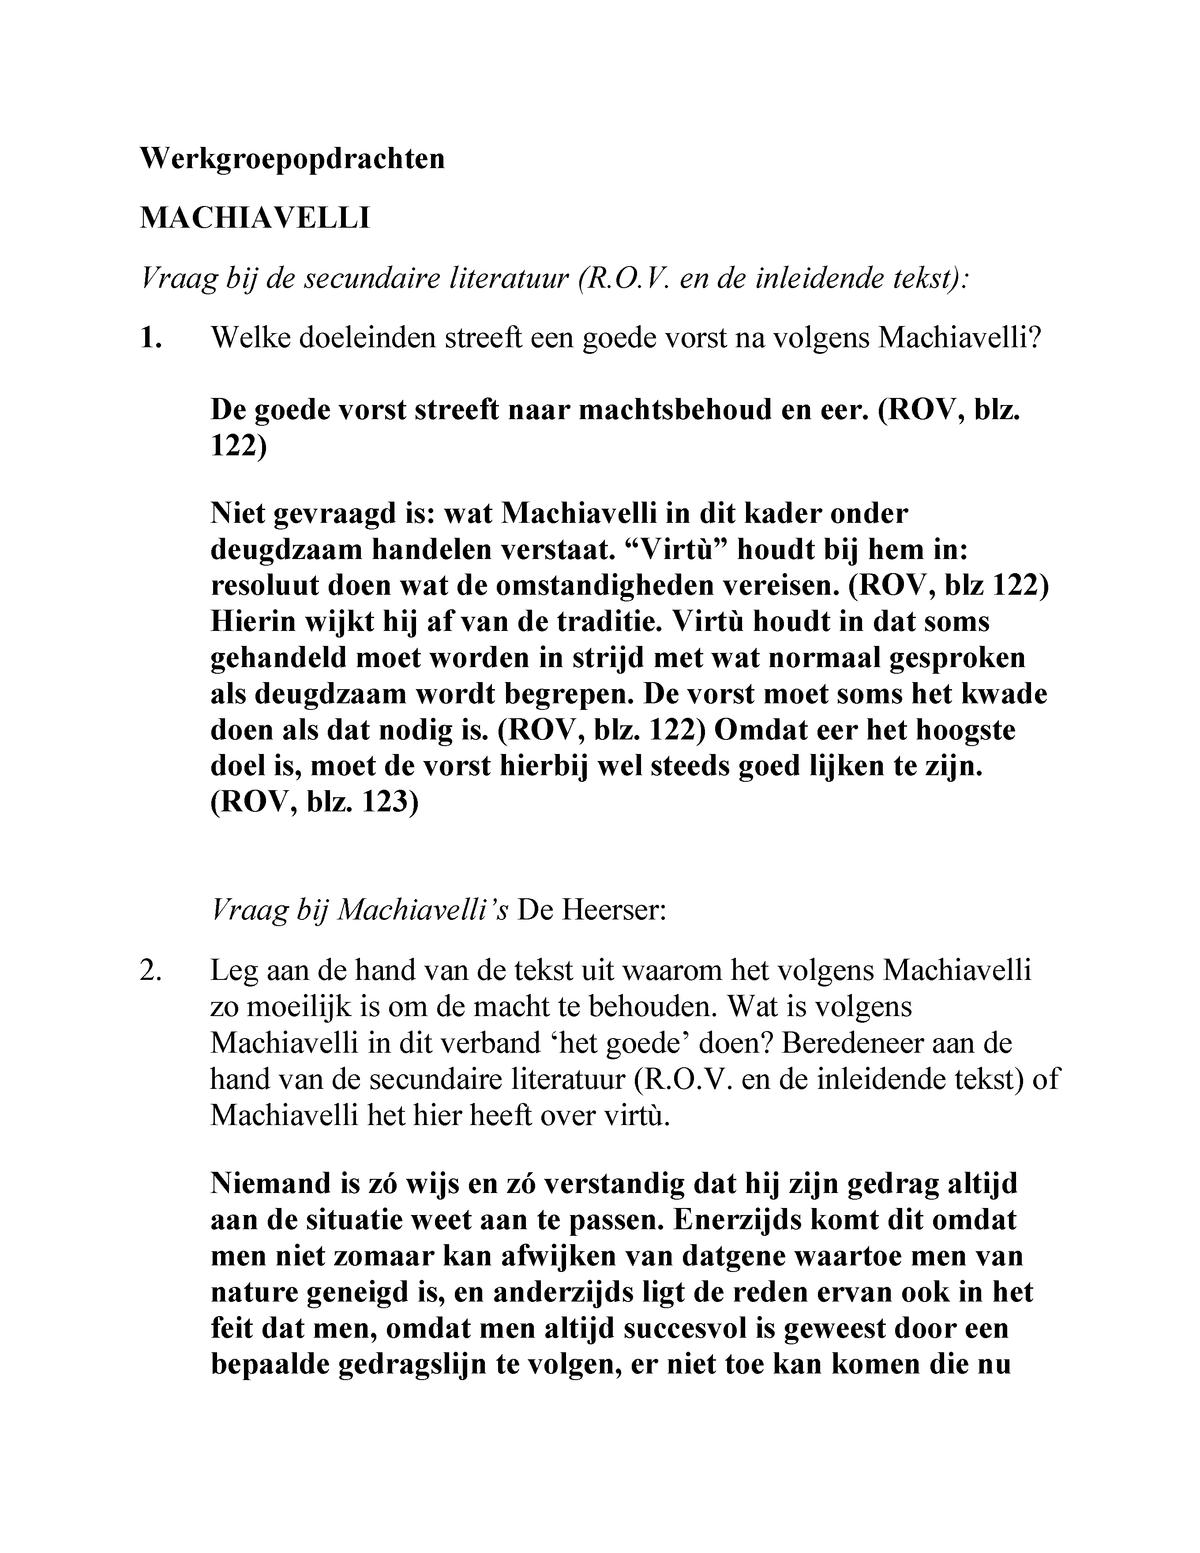 Werkgroep 4 Encyclopedie Der Rechtswetenschap I Vu